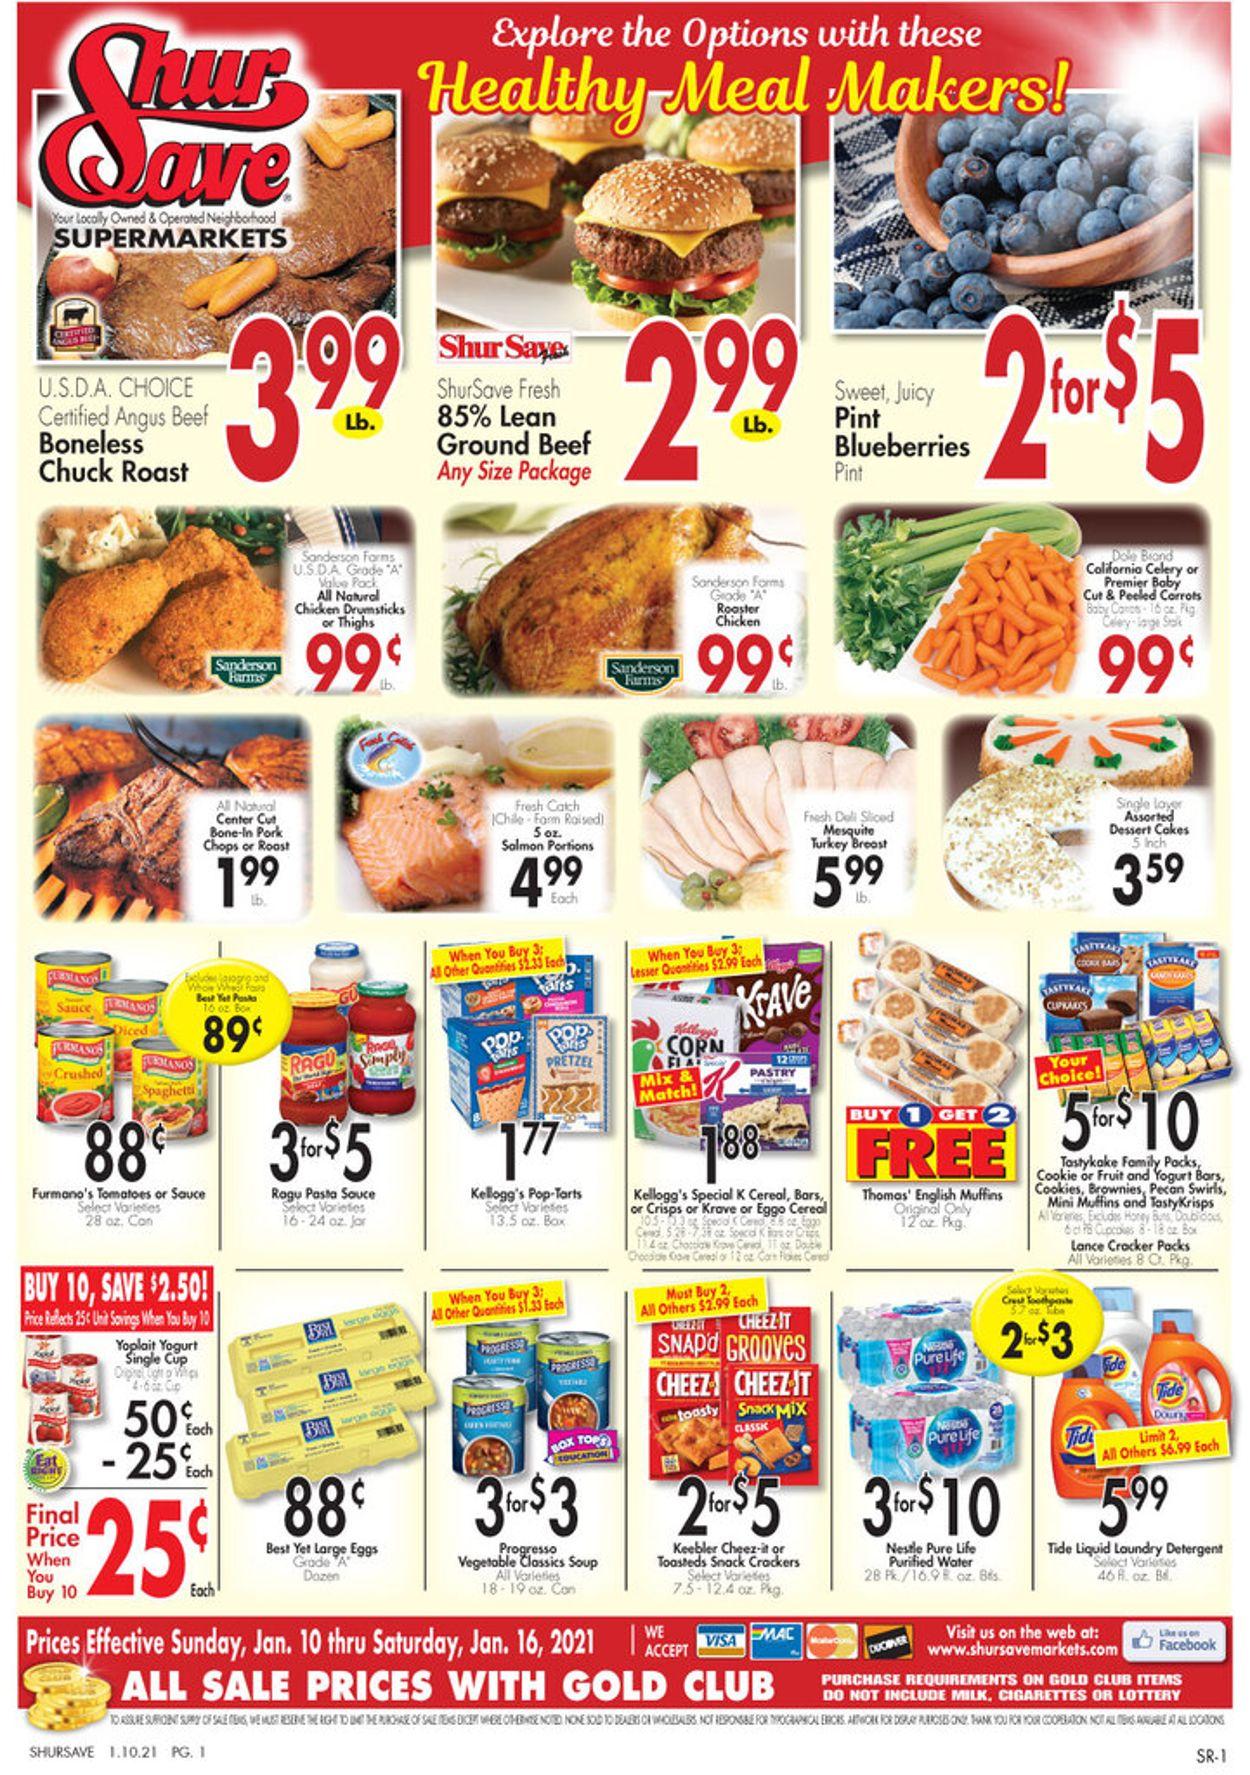 Gerrity's Supermarkets Weekly Ad Circular - valid 01/10-01/16/2021